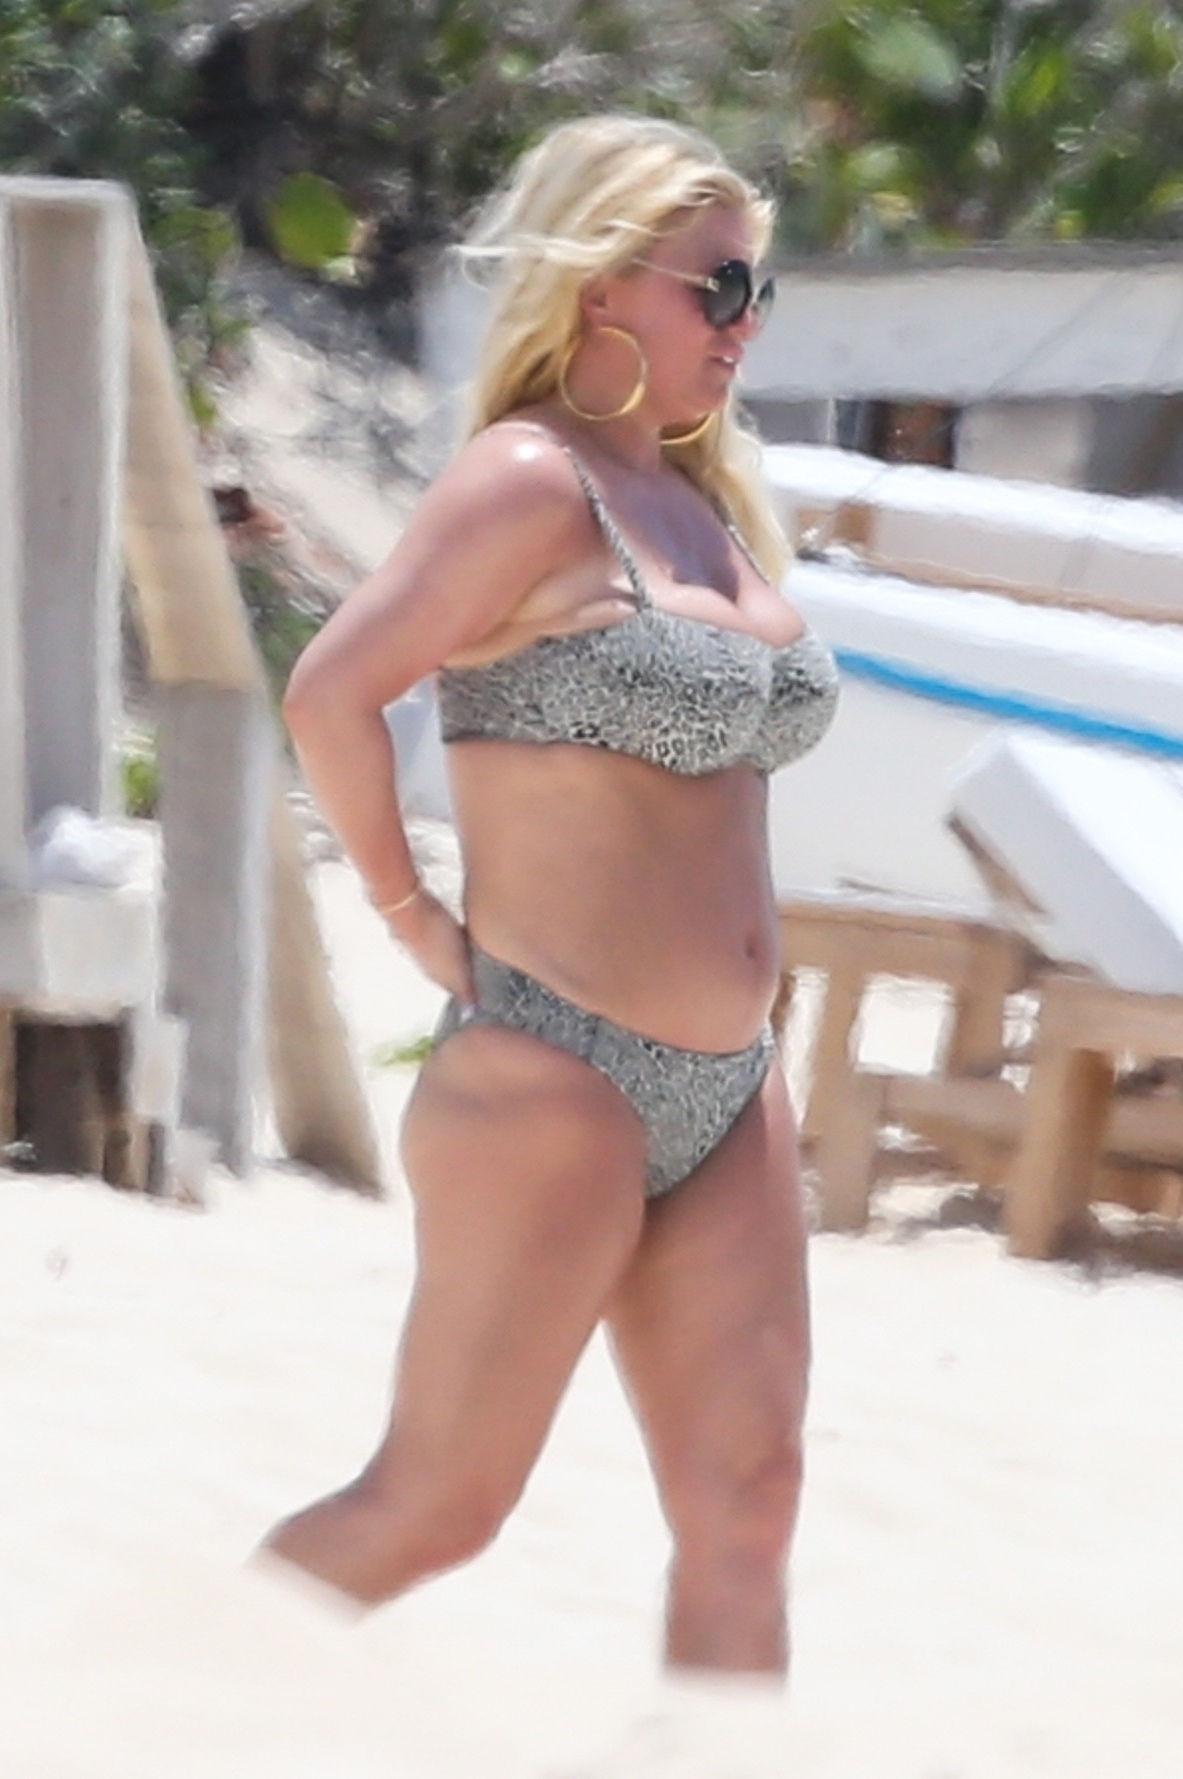 Bikini naked pics jessica simpson